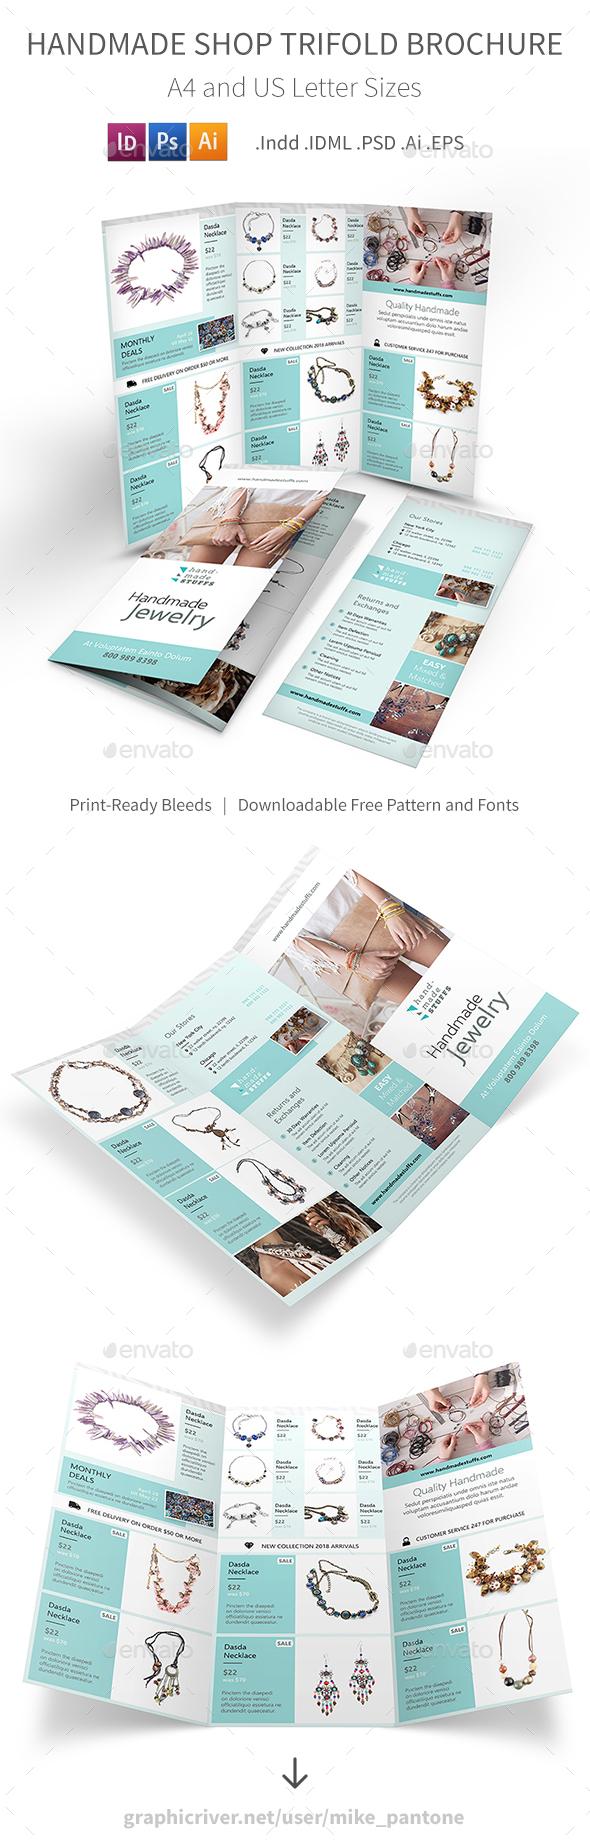 Handmade Shop Trifold Brochure - Informational Brochures